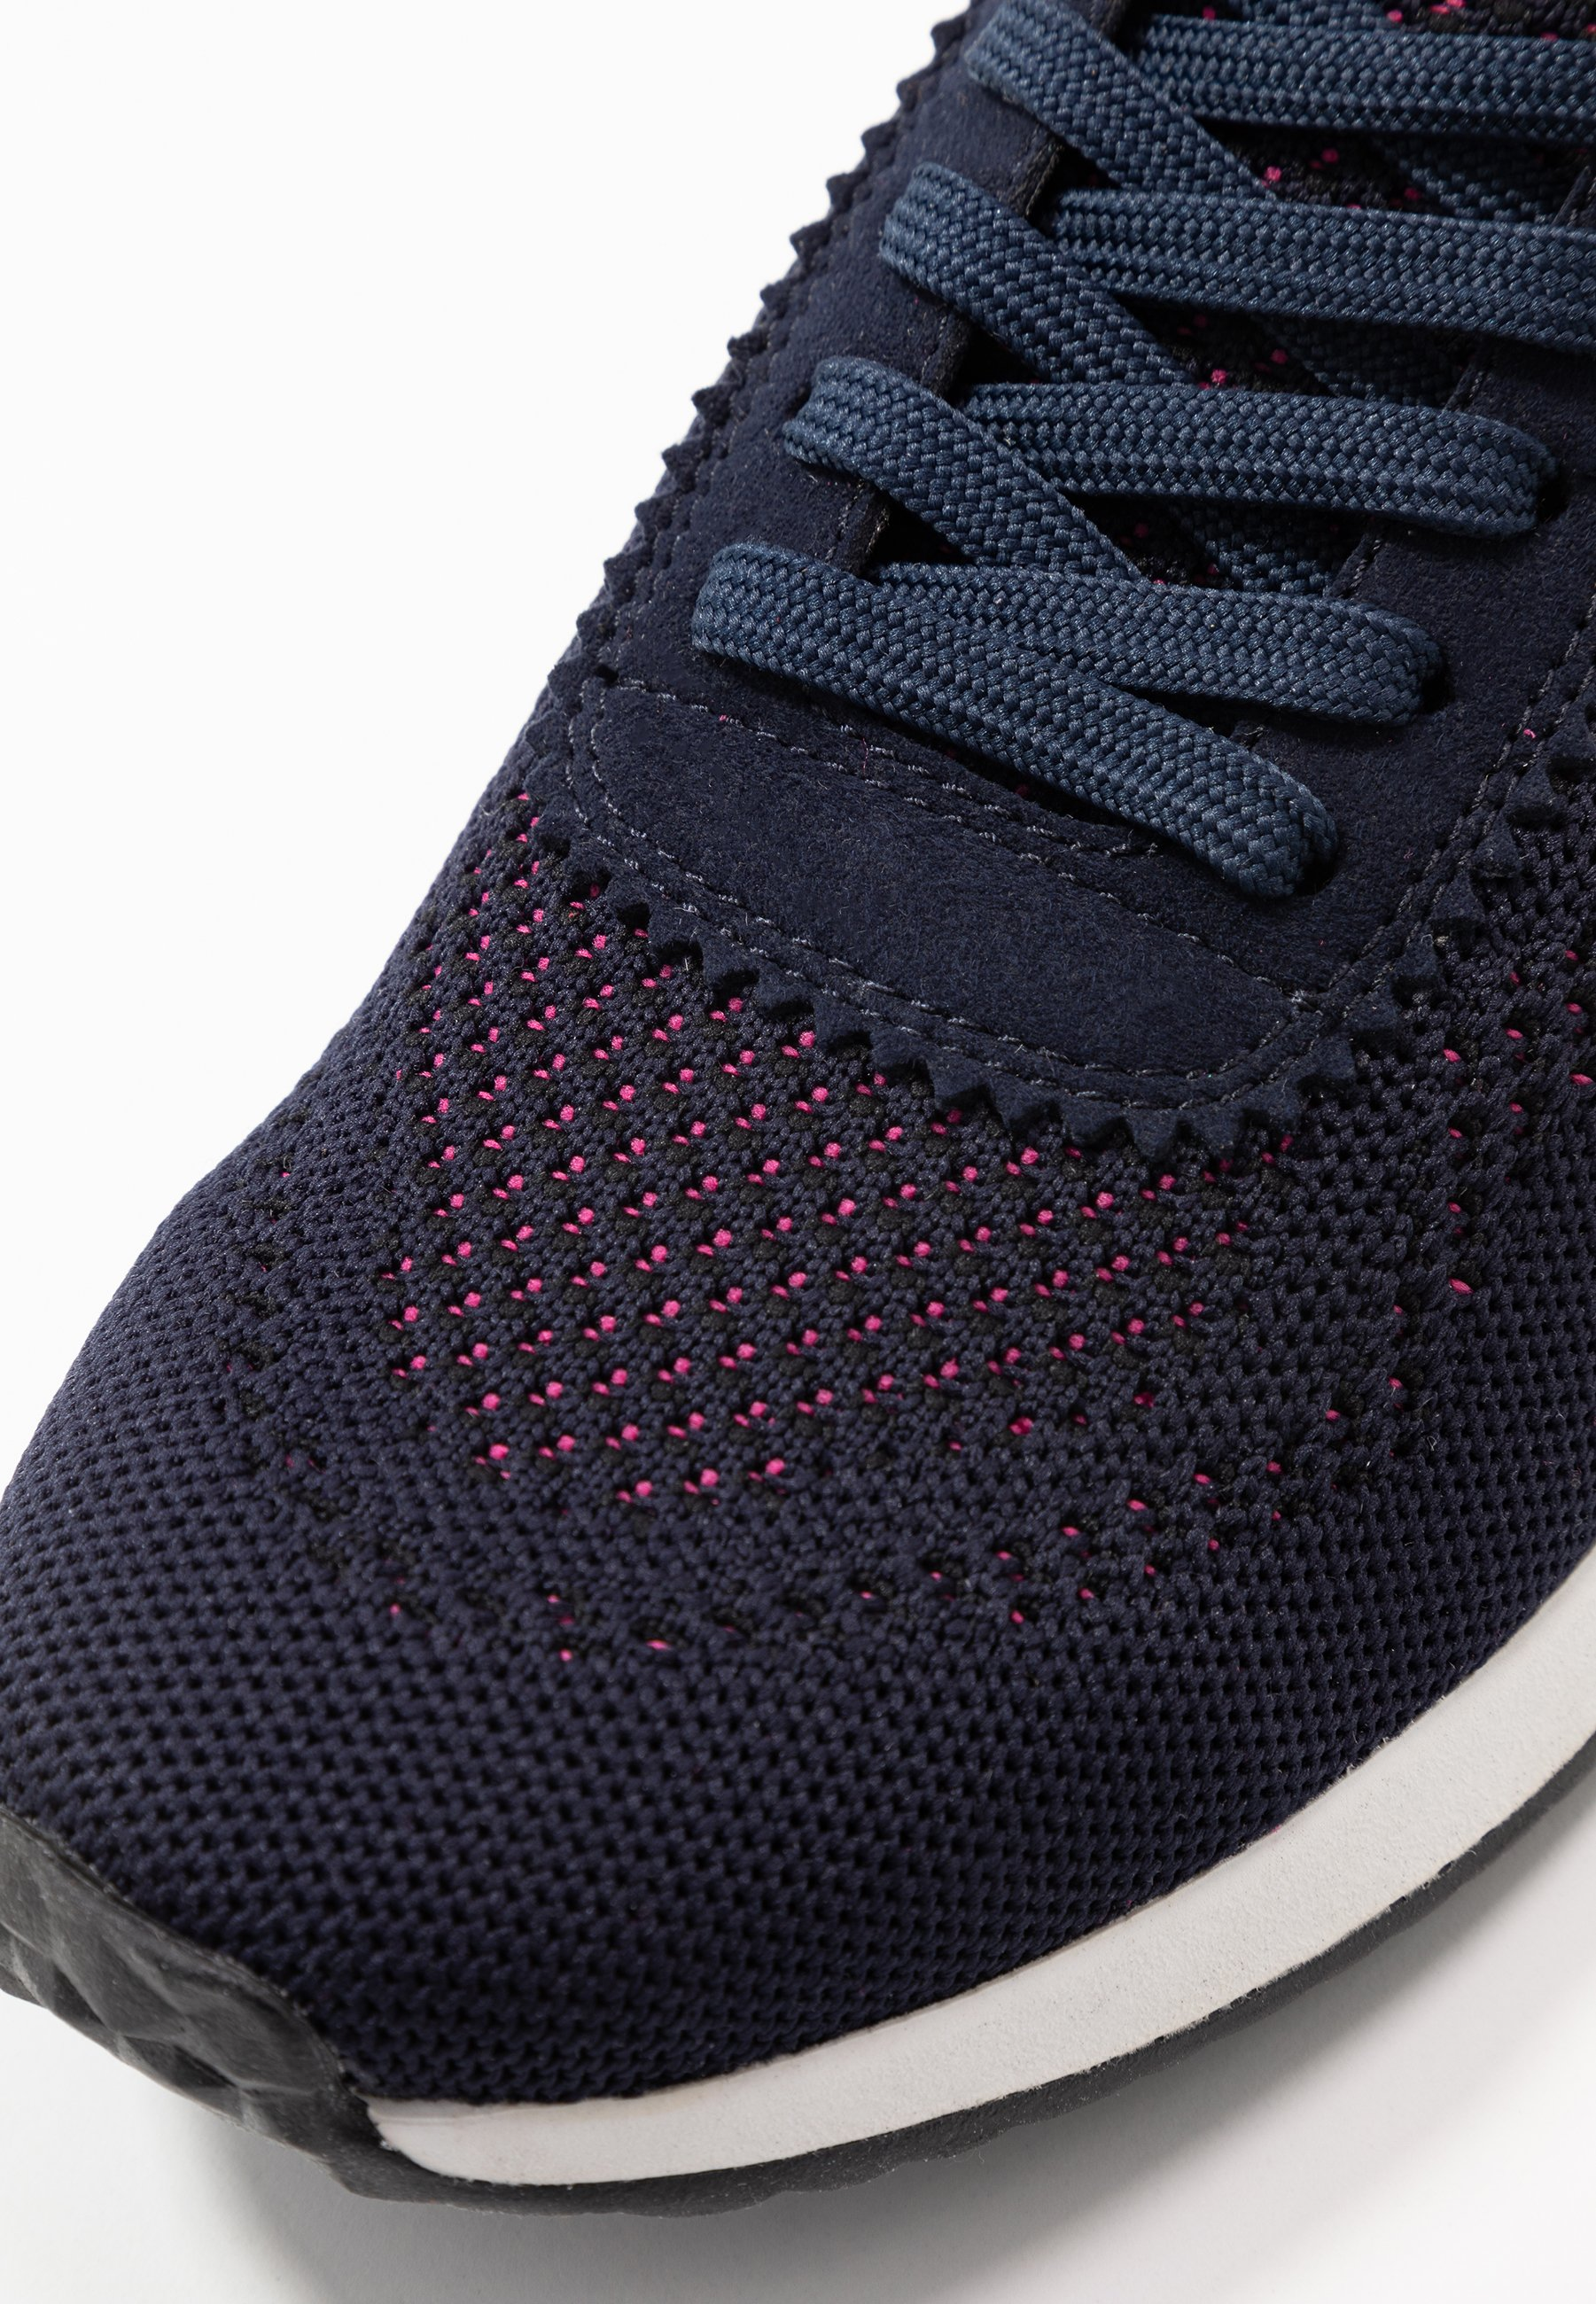 Tamaris Fashletics Sneakers basse - navy/magenta cMQBN4Sj